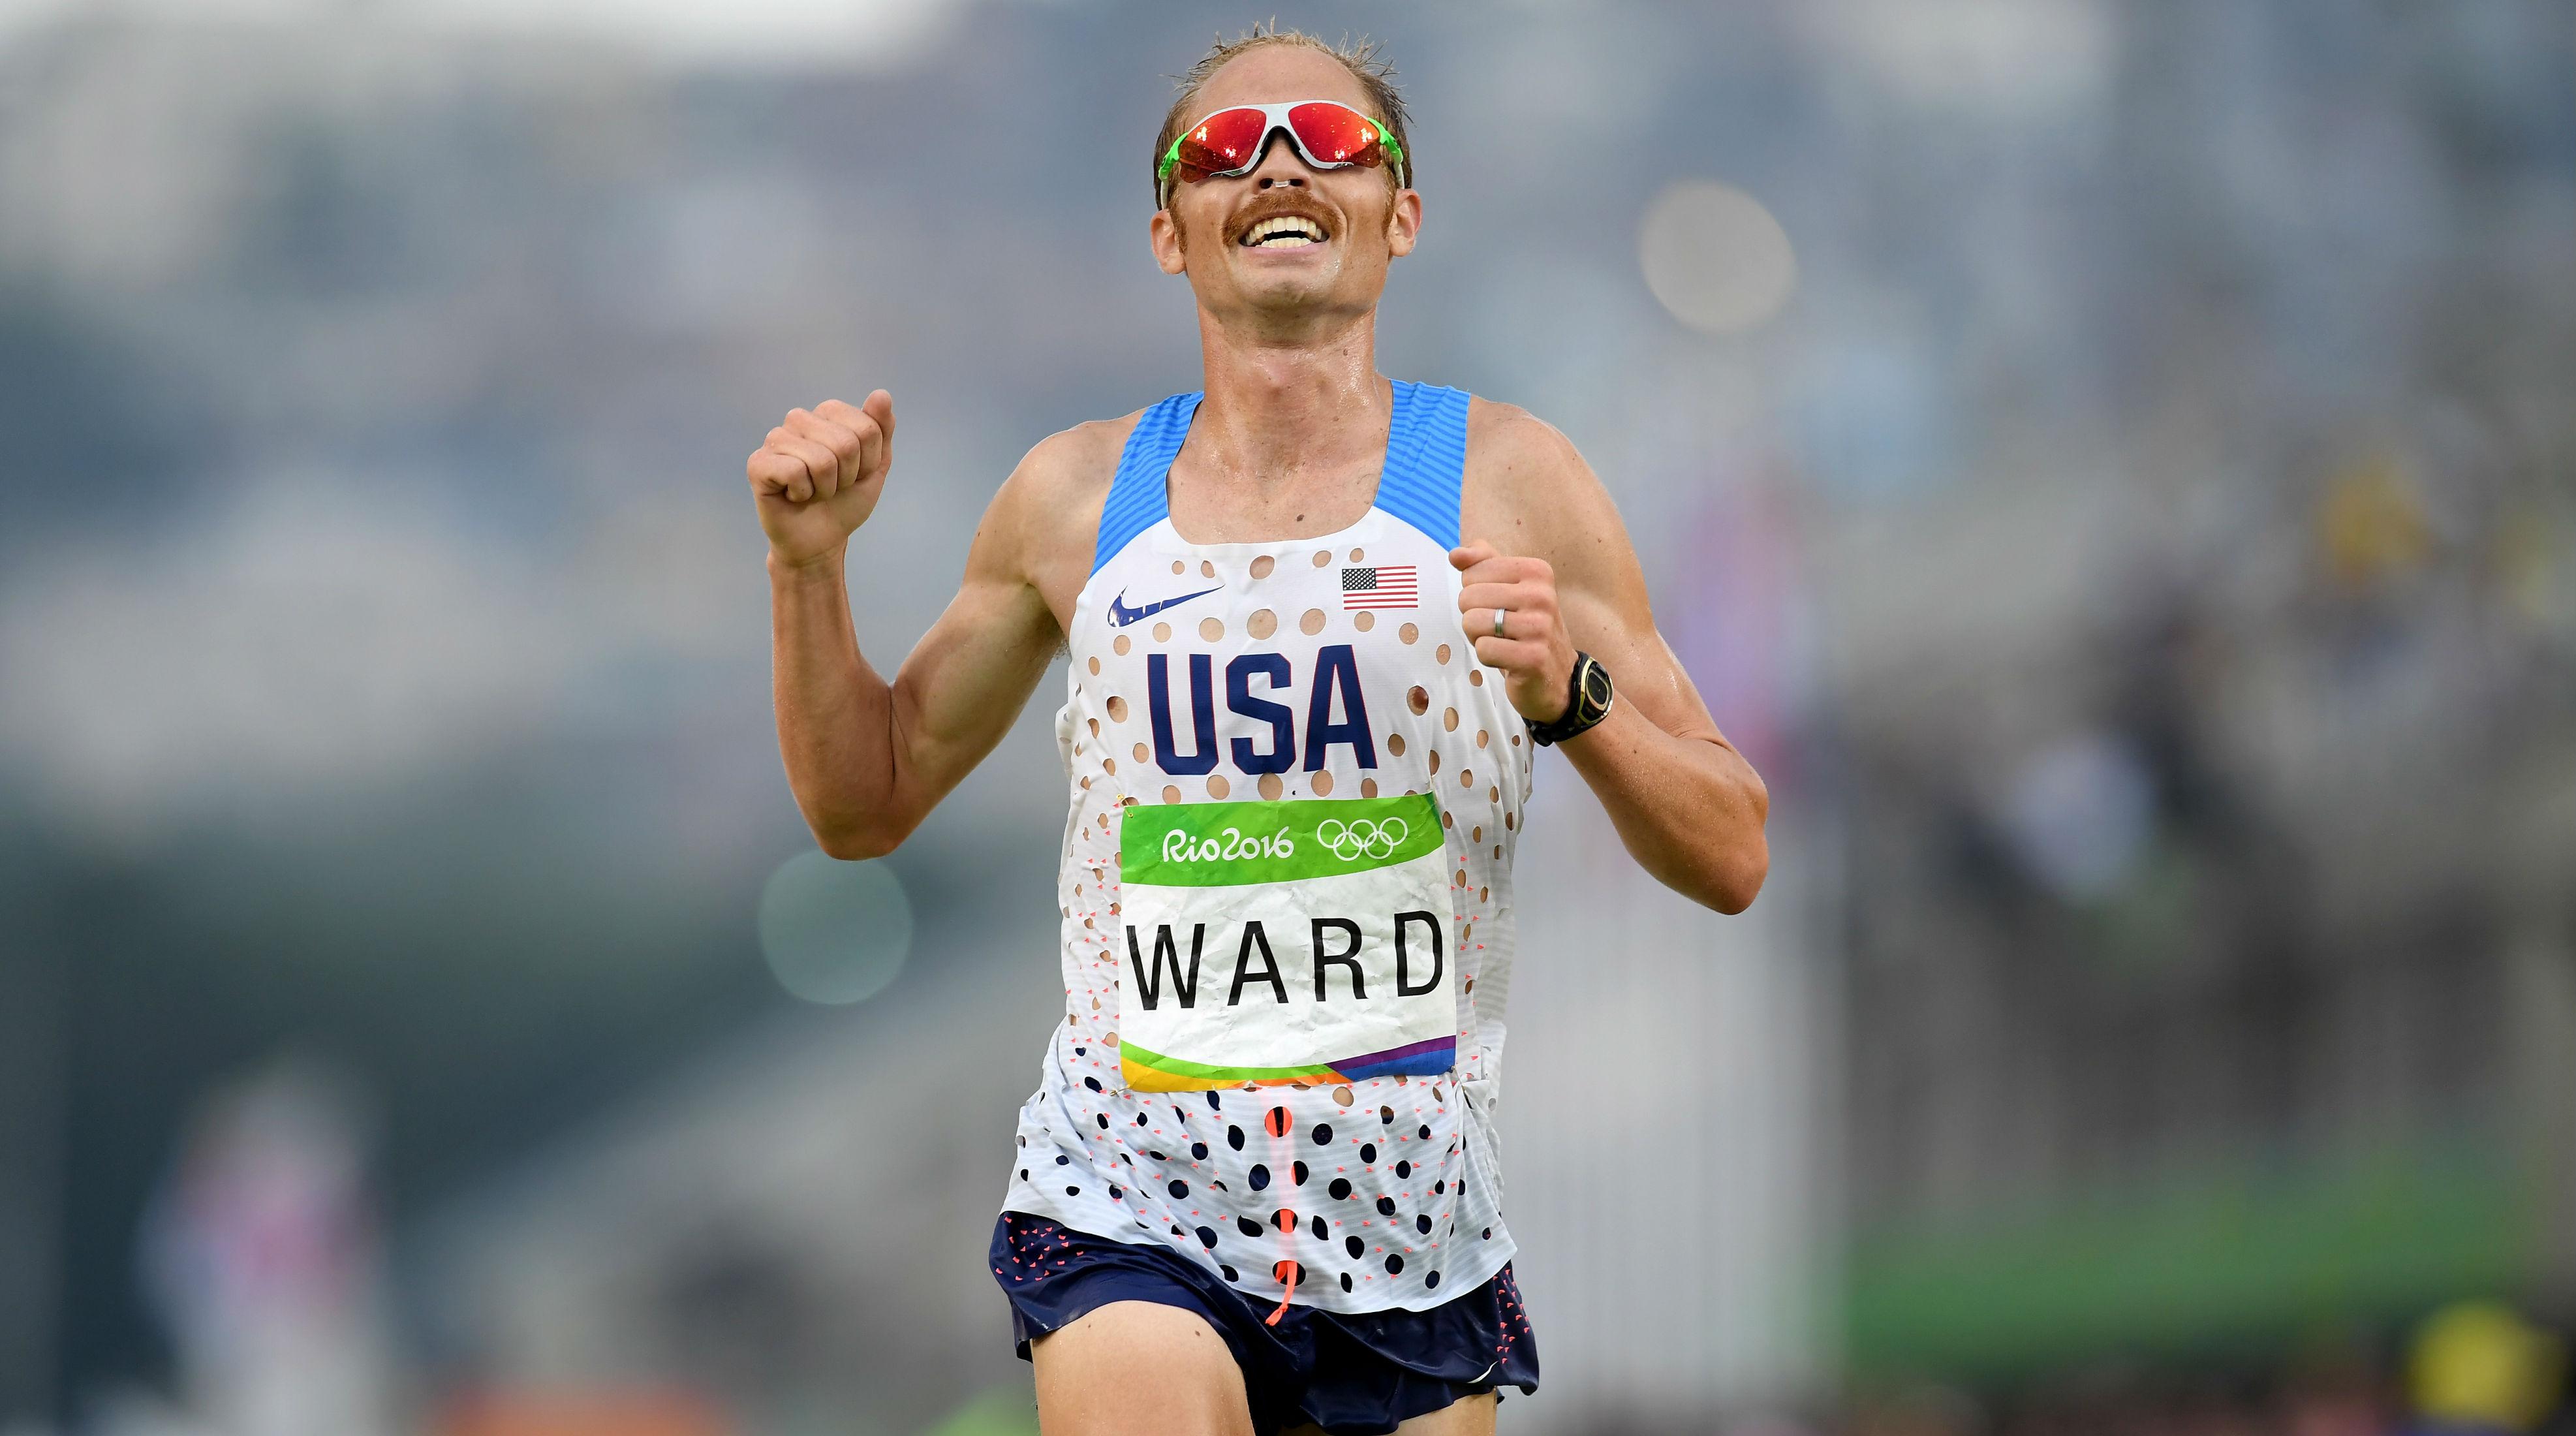 Jared Ward - NYC Marathon